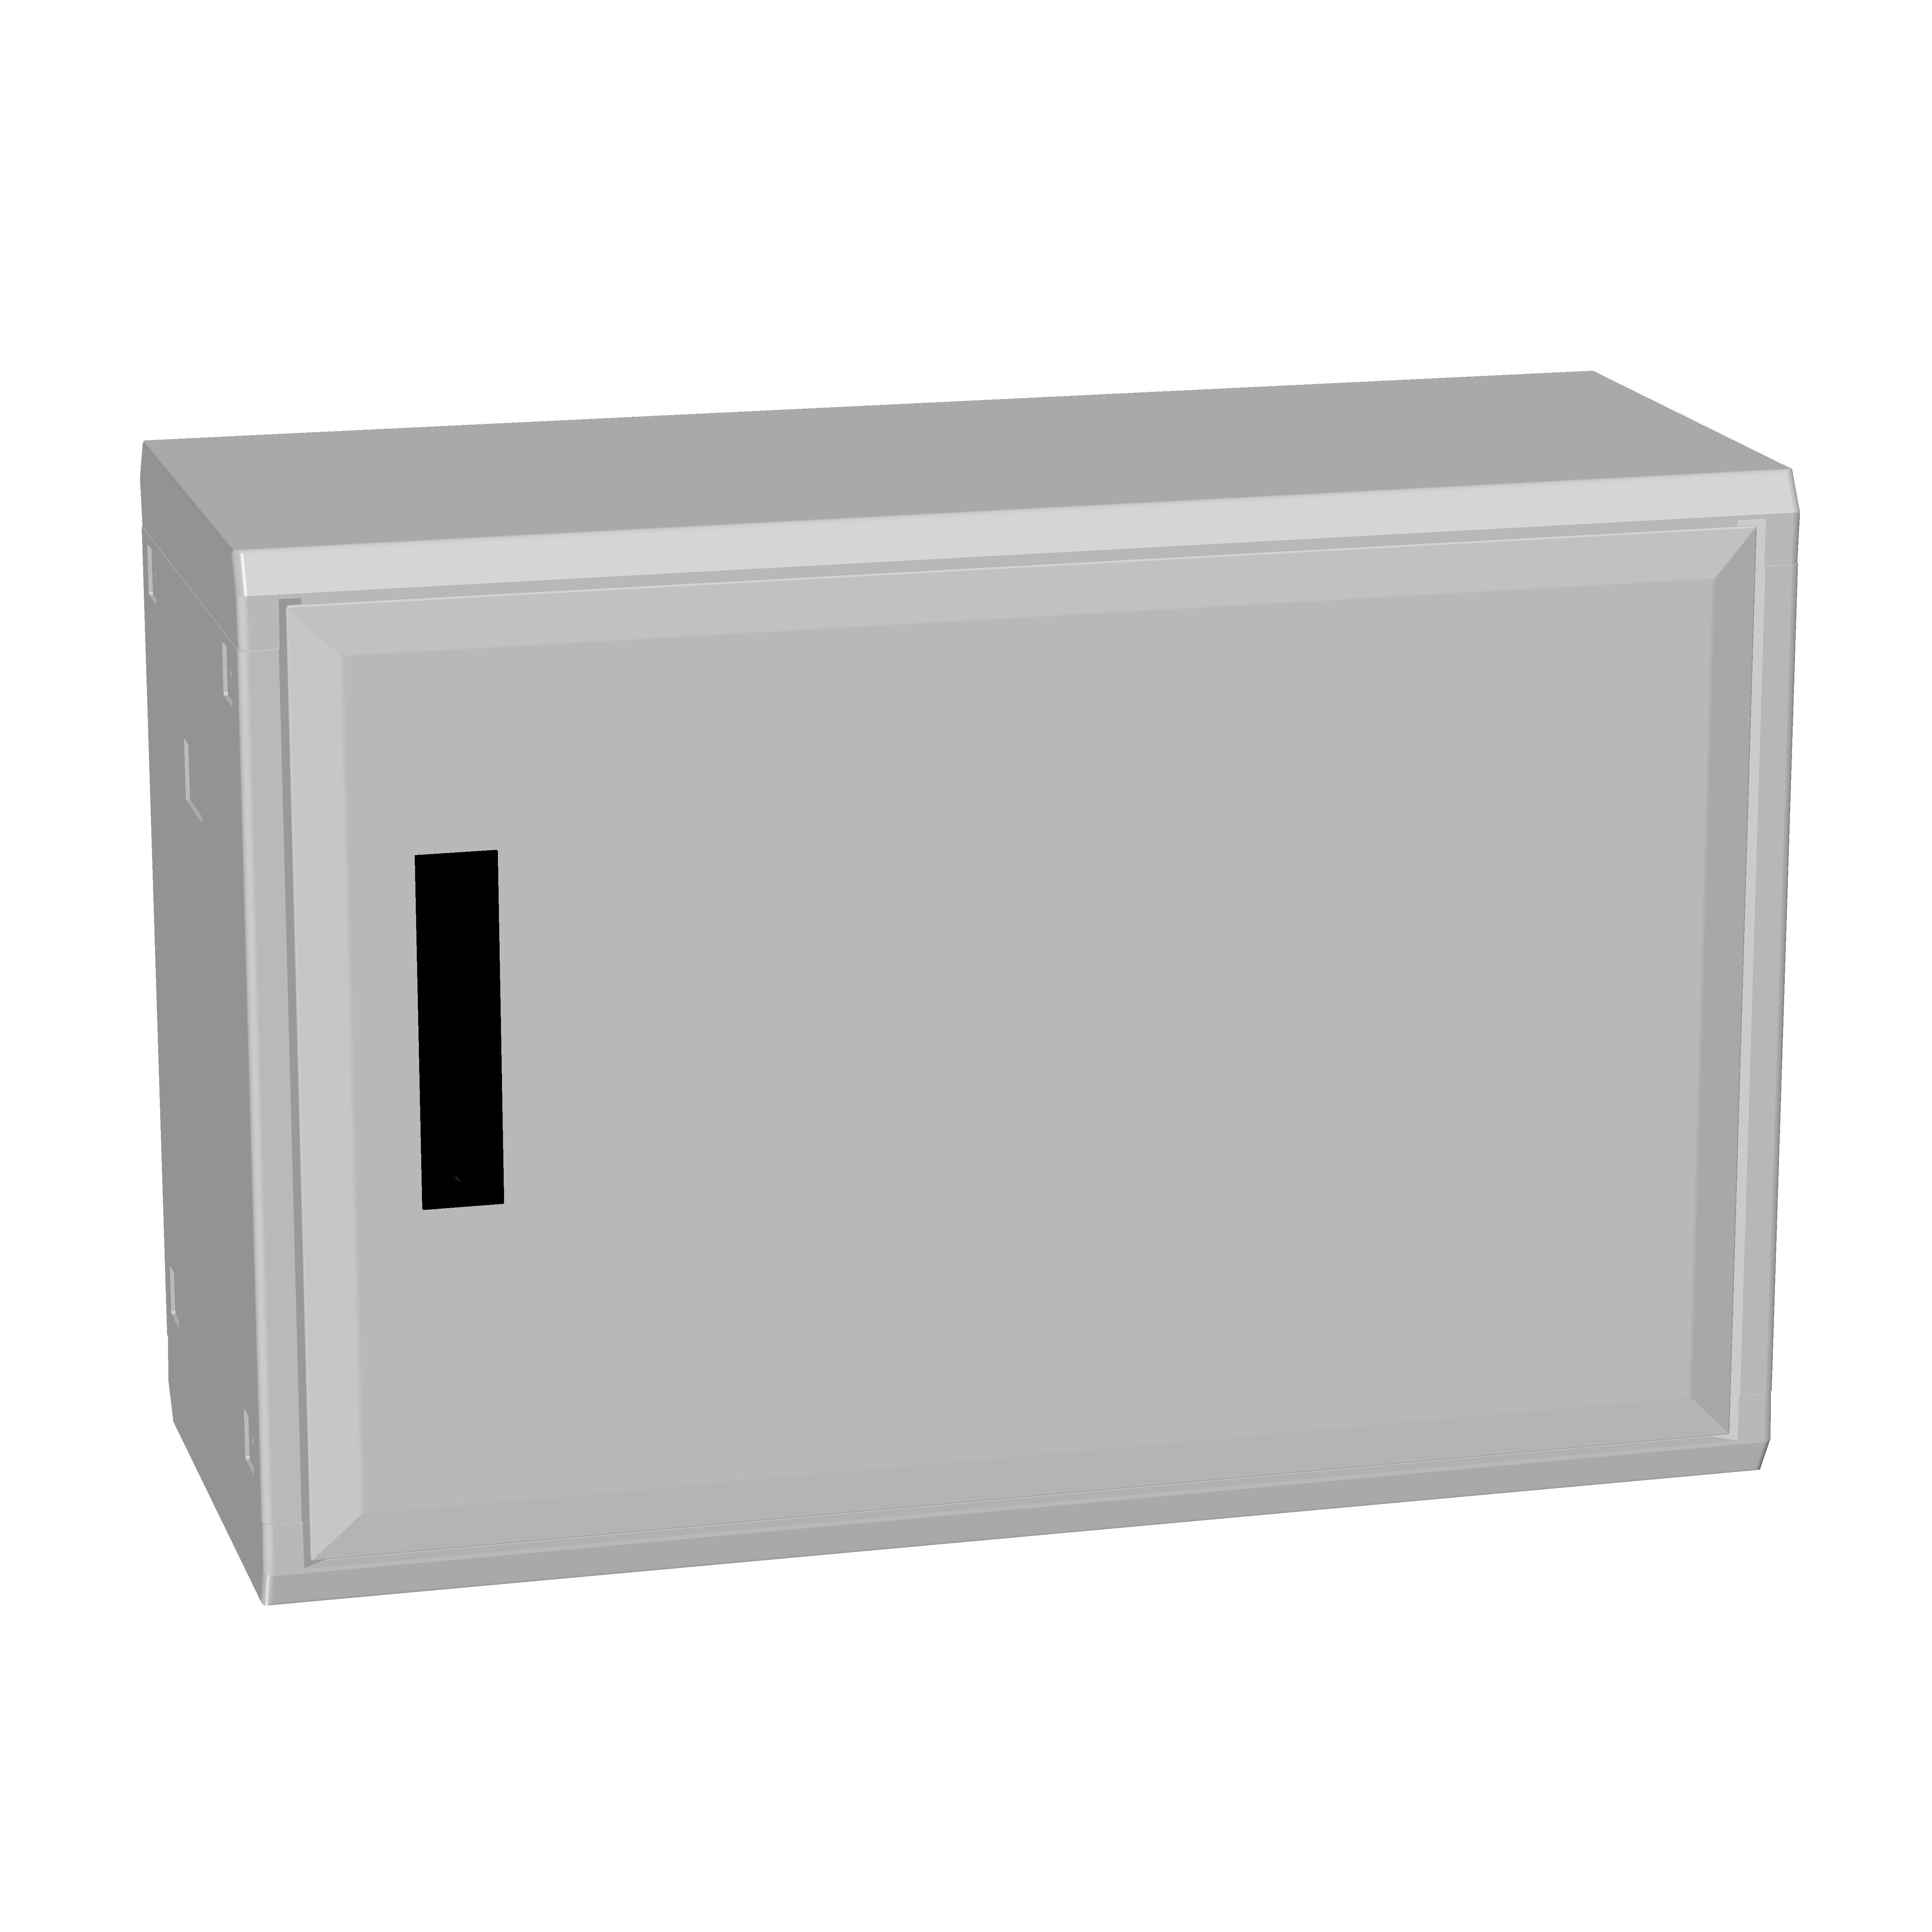 1 Stk Polyesterschrank, eintürig, 500x750x312 POCC2330--